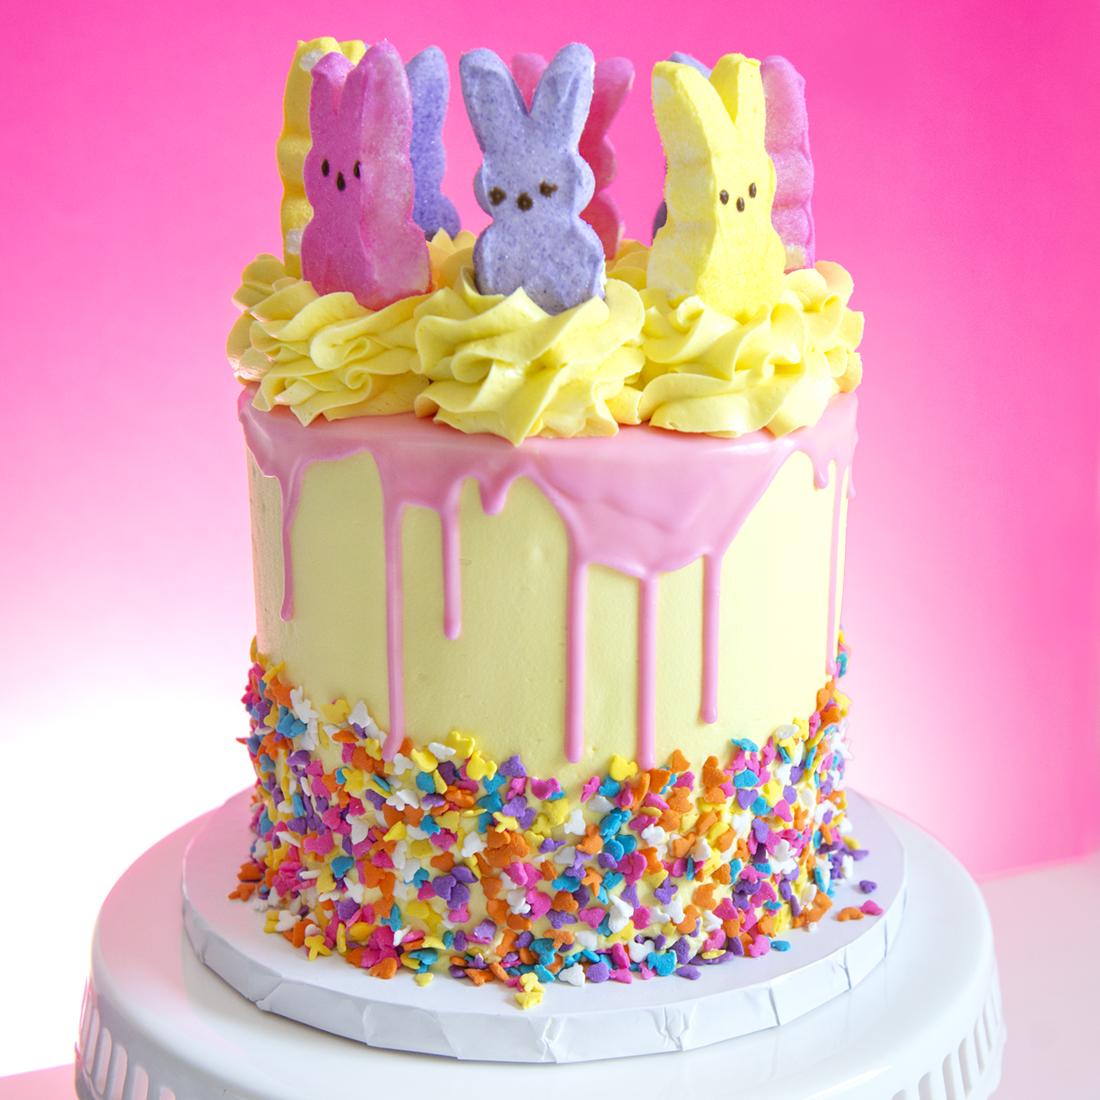 Marshmallow Peep Cake -